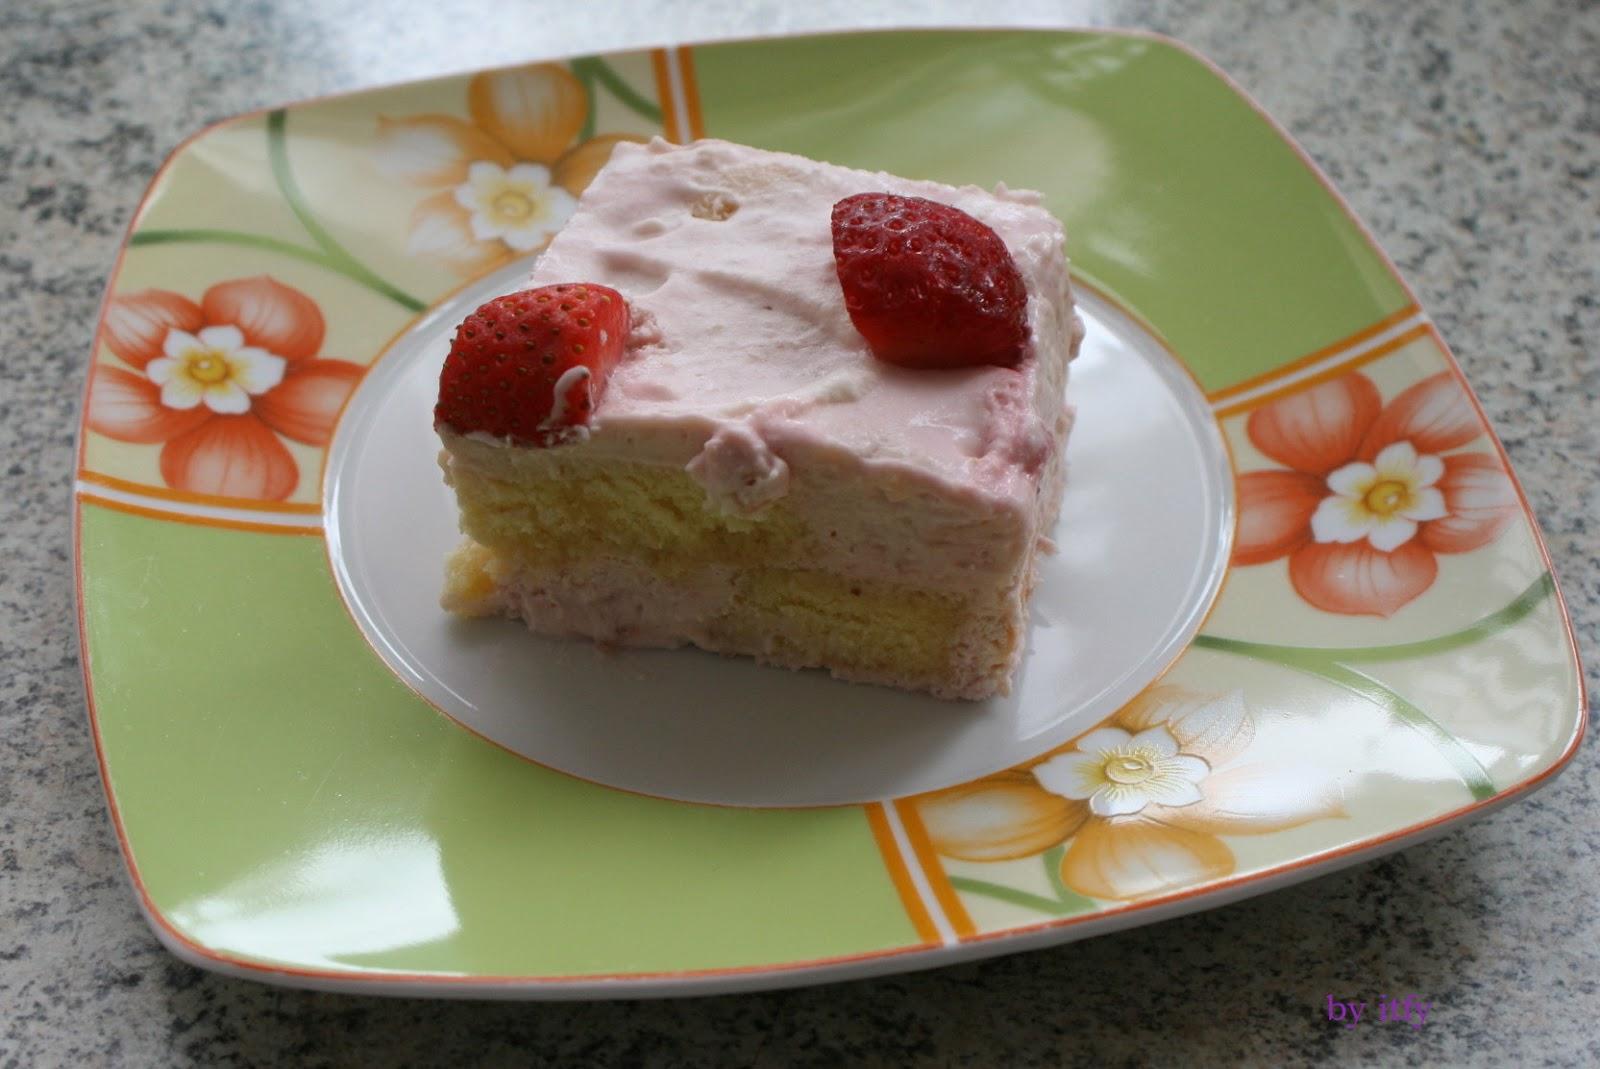 I Test For You Erdbeer Quark Sahne Schnitten Mit Dem Lares